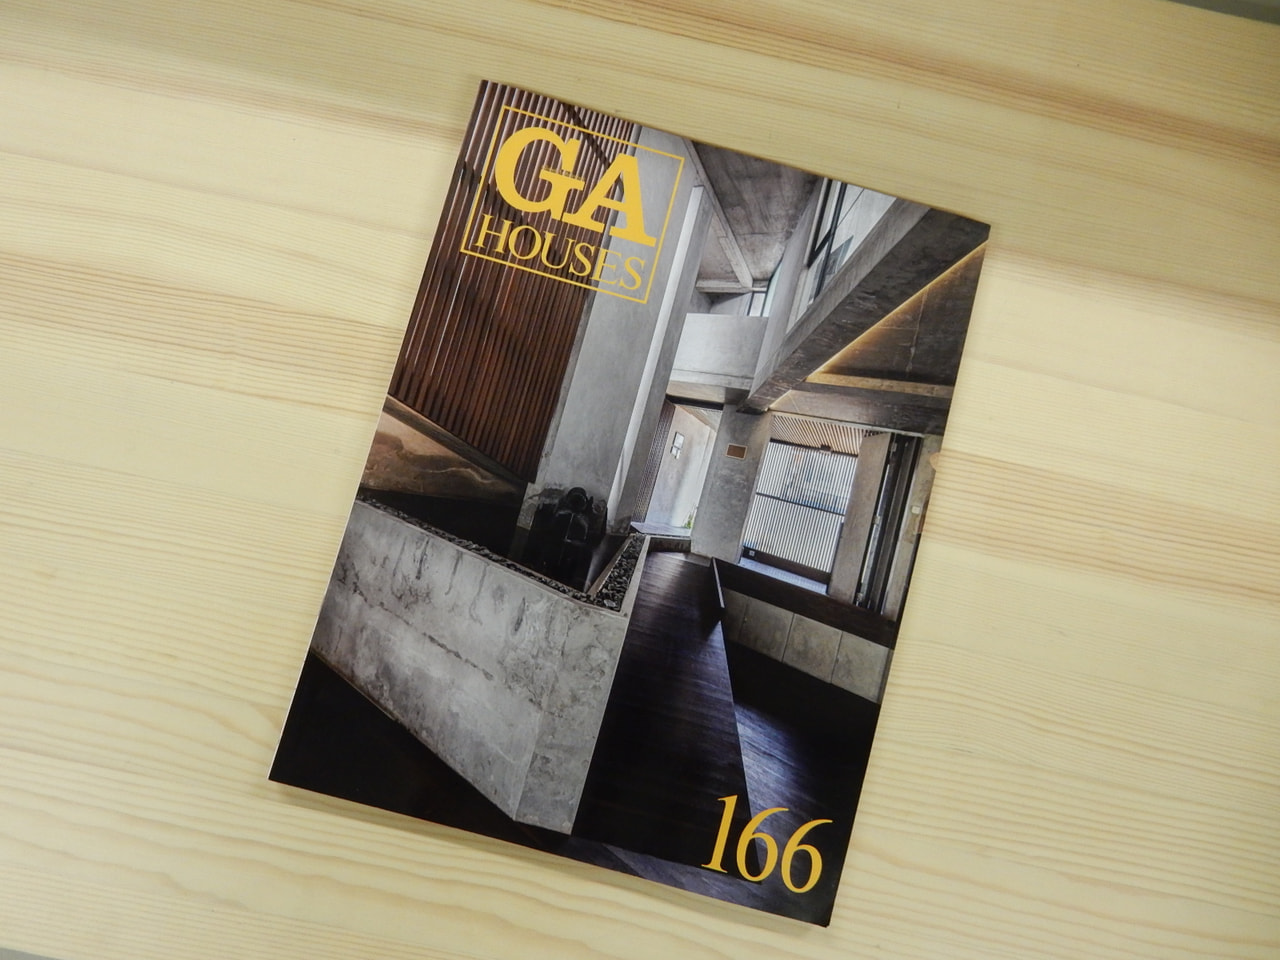 『GA HOUSES』『住宅特集』に白須先生が設計された「並びの住宅」が掲載されました